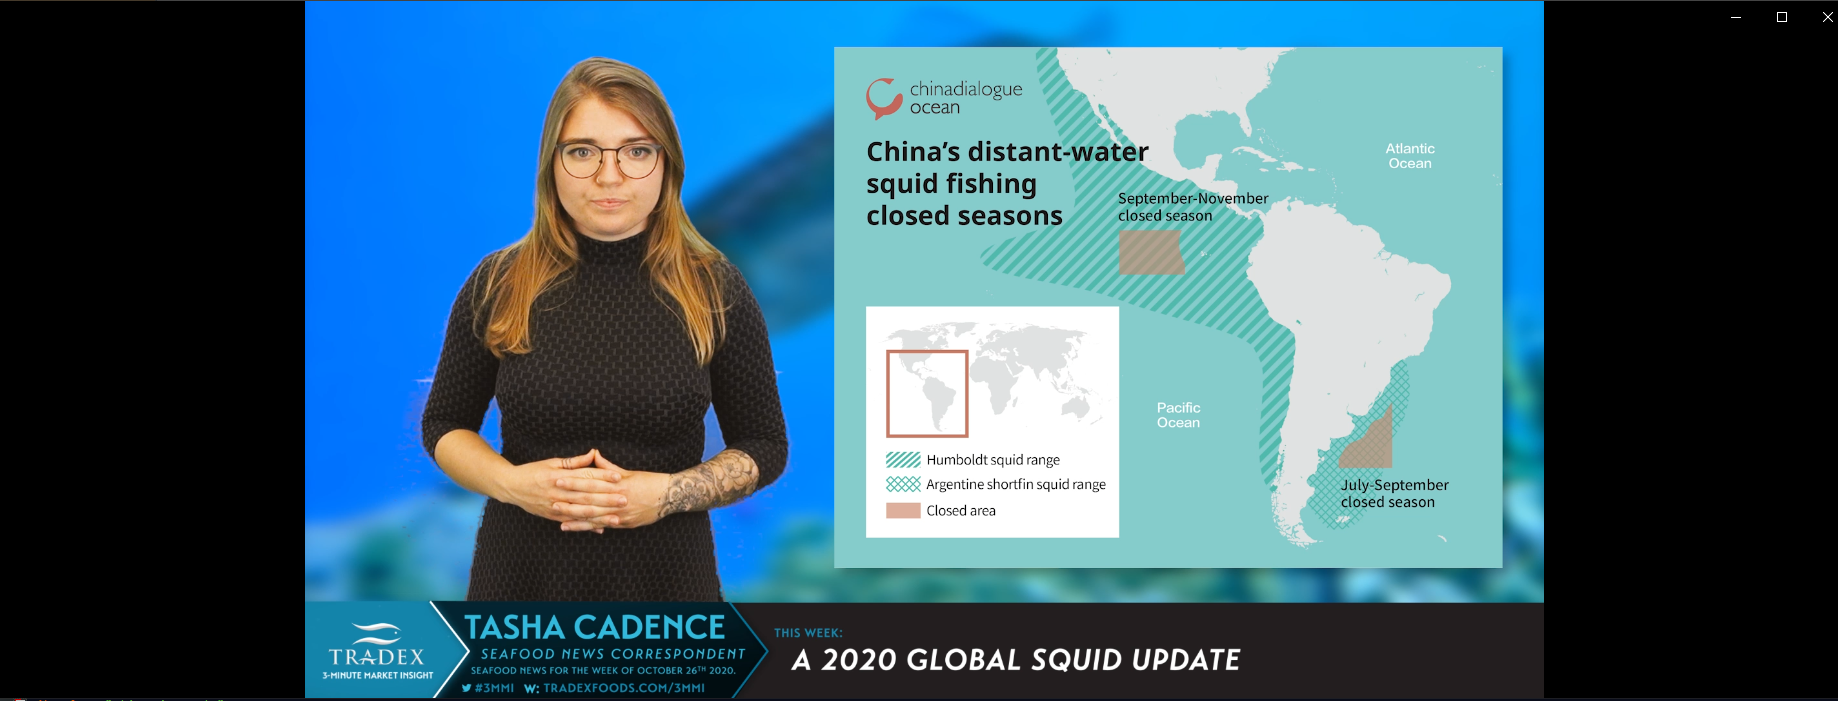 Chinese Season Closures